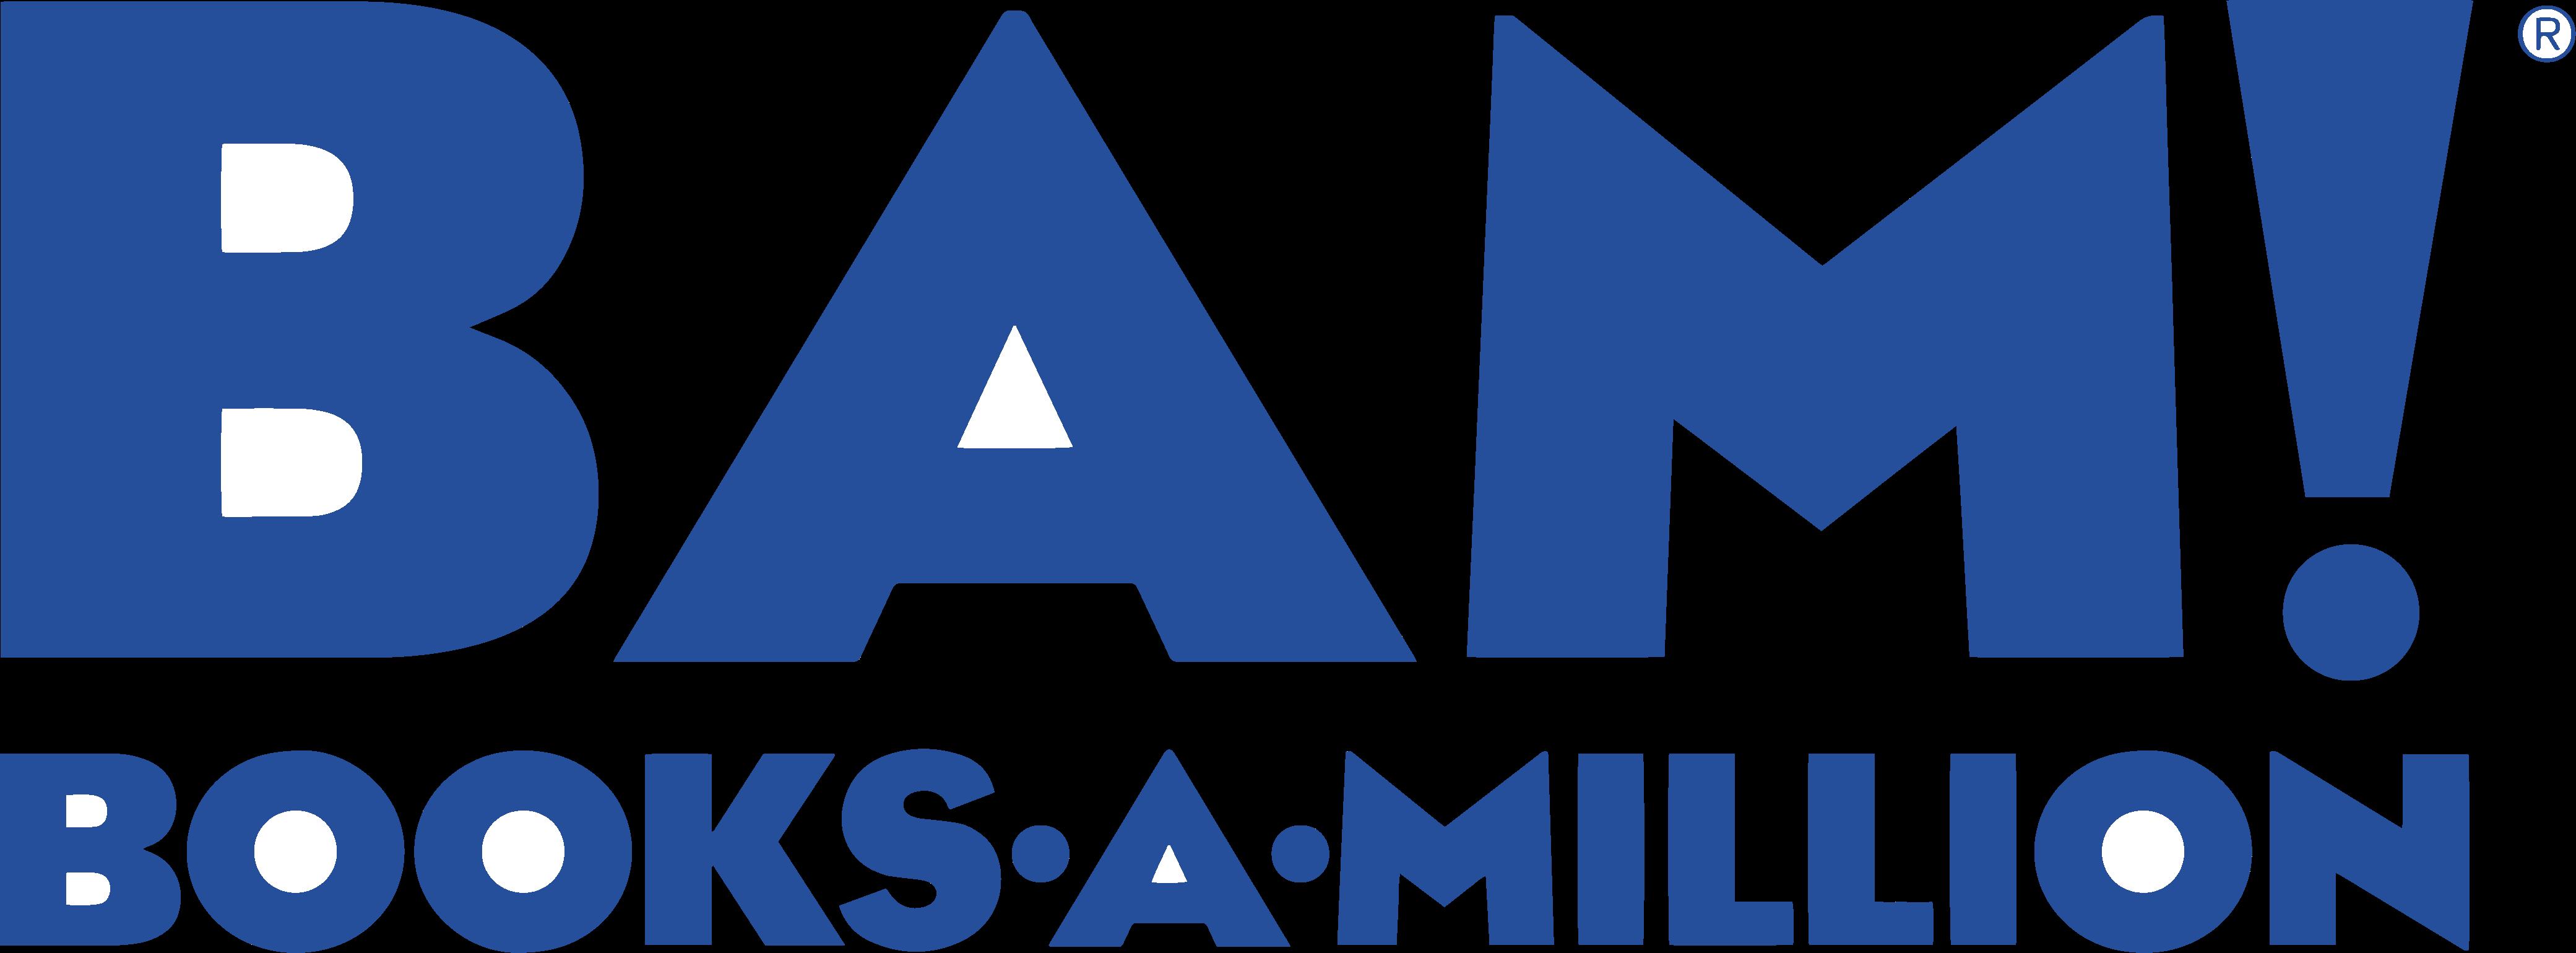 books a milion logo